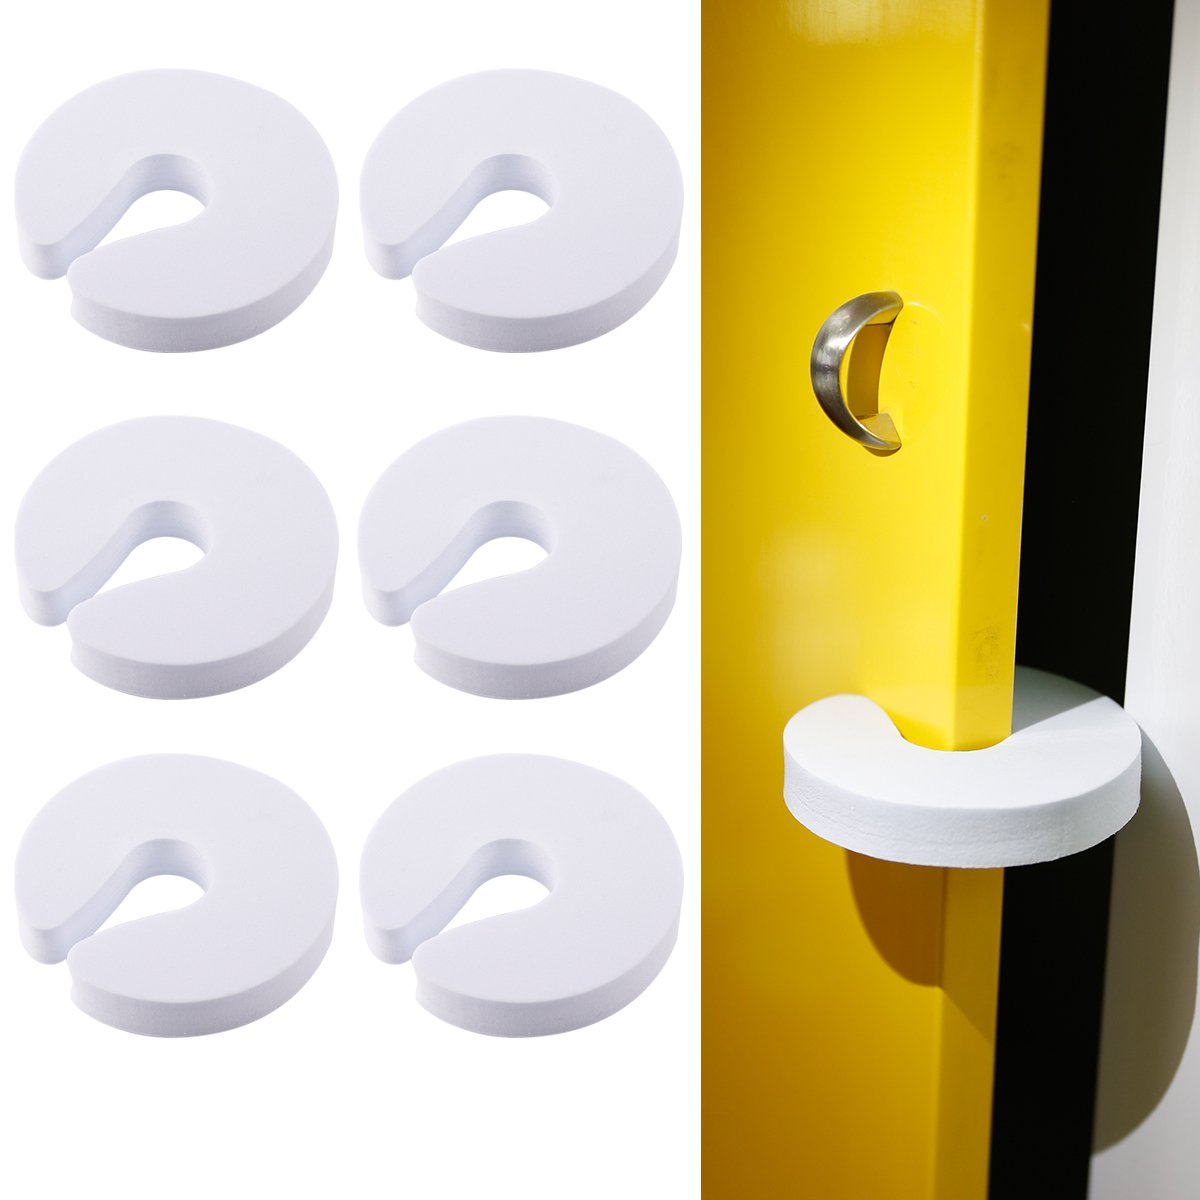 Tonyko 7 PCS Tope Clip Protector Puerta Dedos Seguridad Pa Beb/é Baby